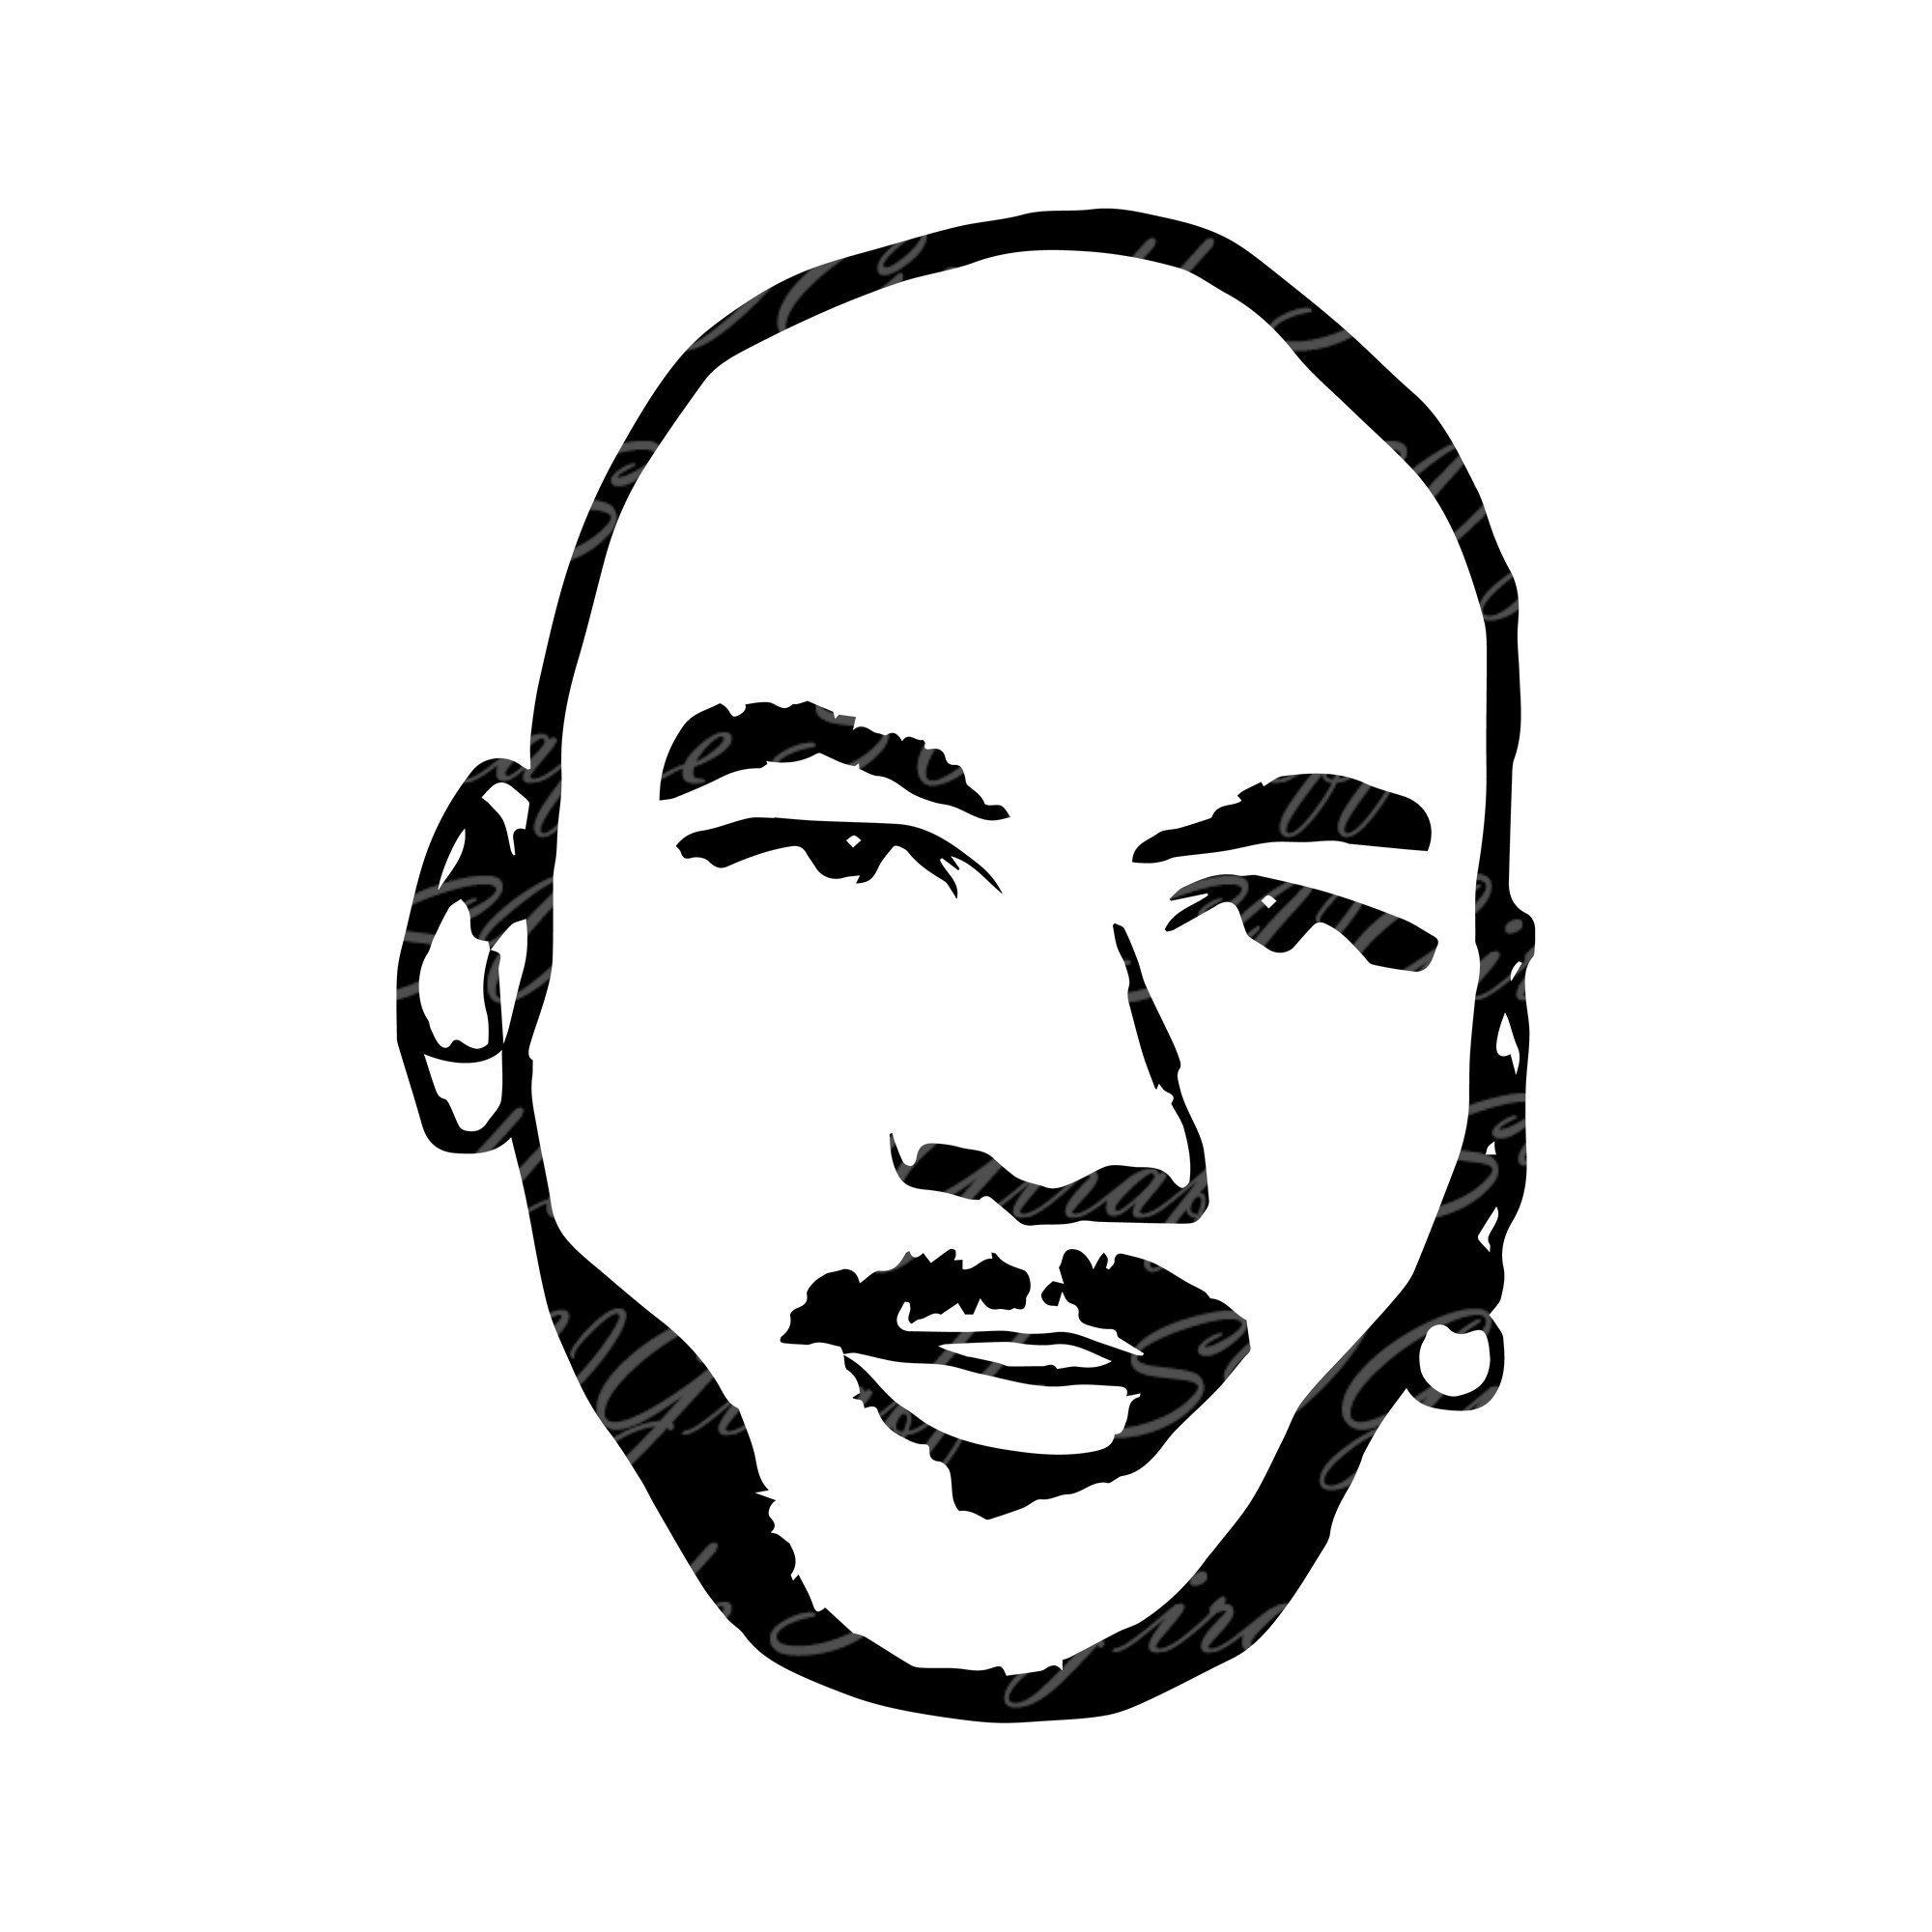 Michael jordan face SVG DXF PNG pdf jpg files michael